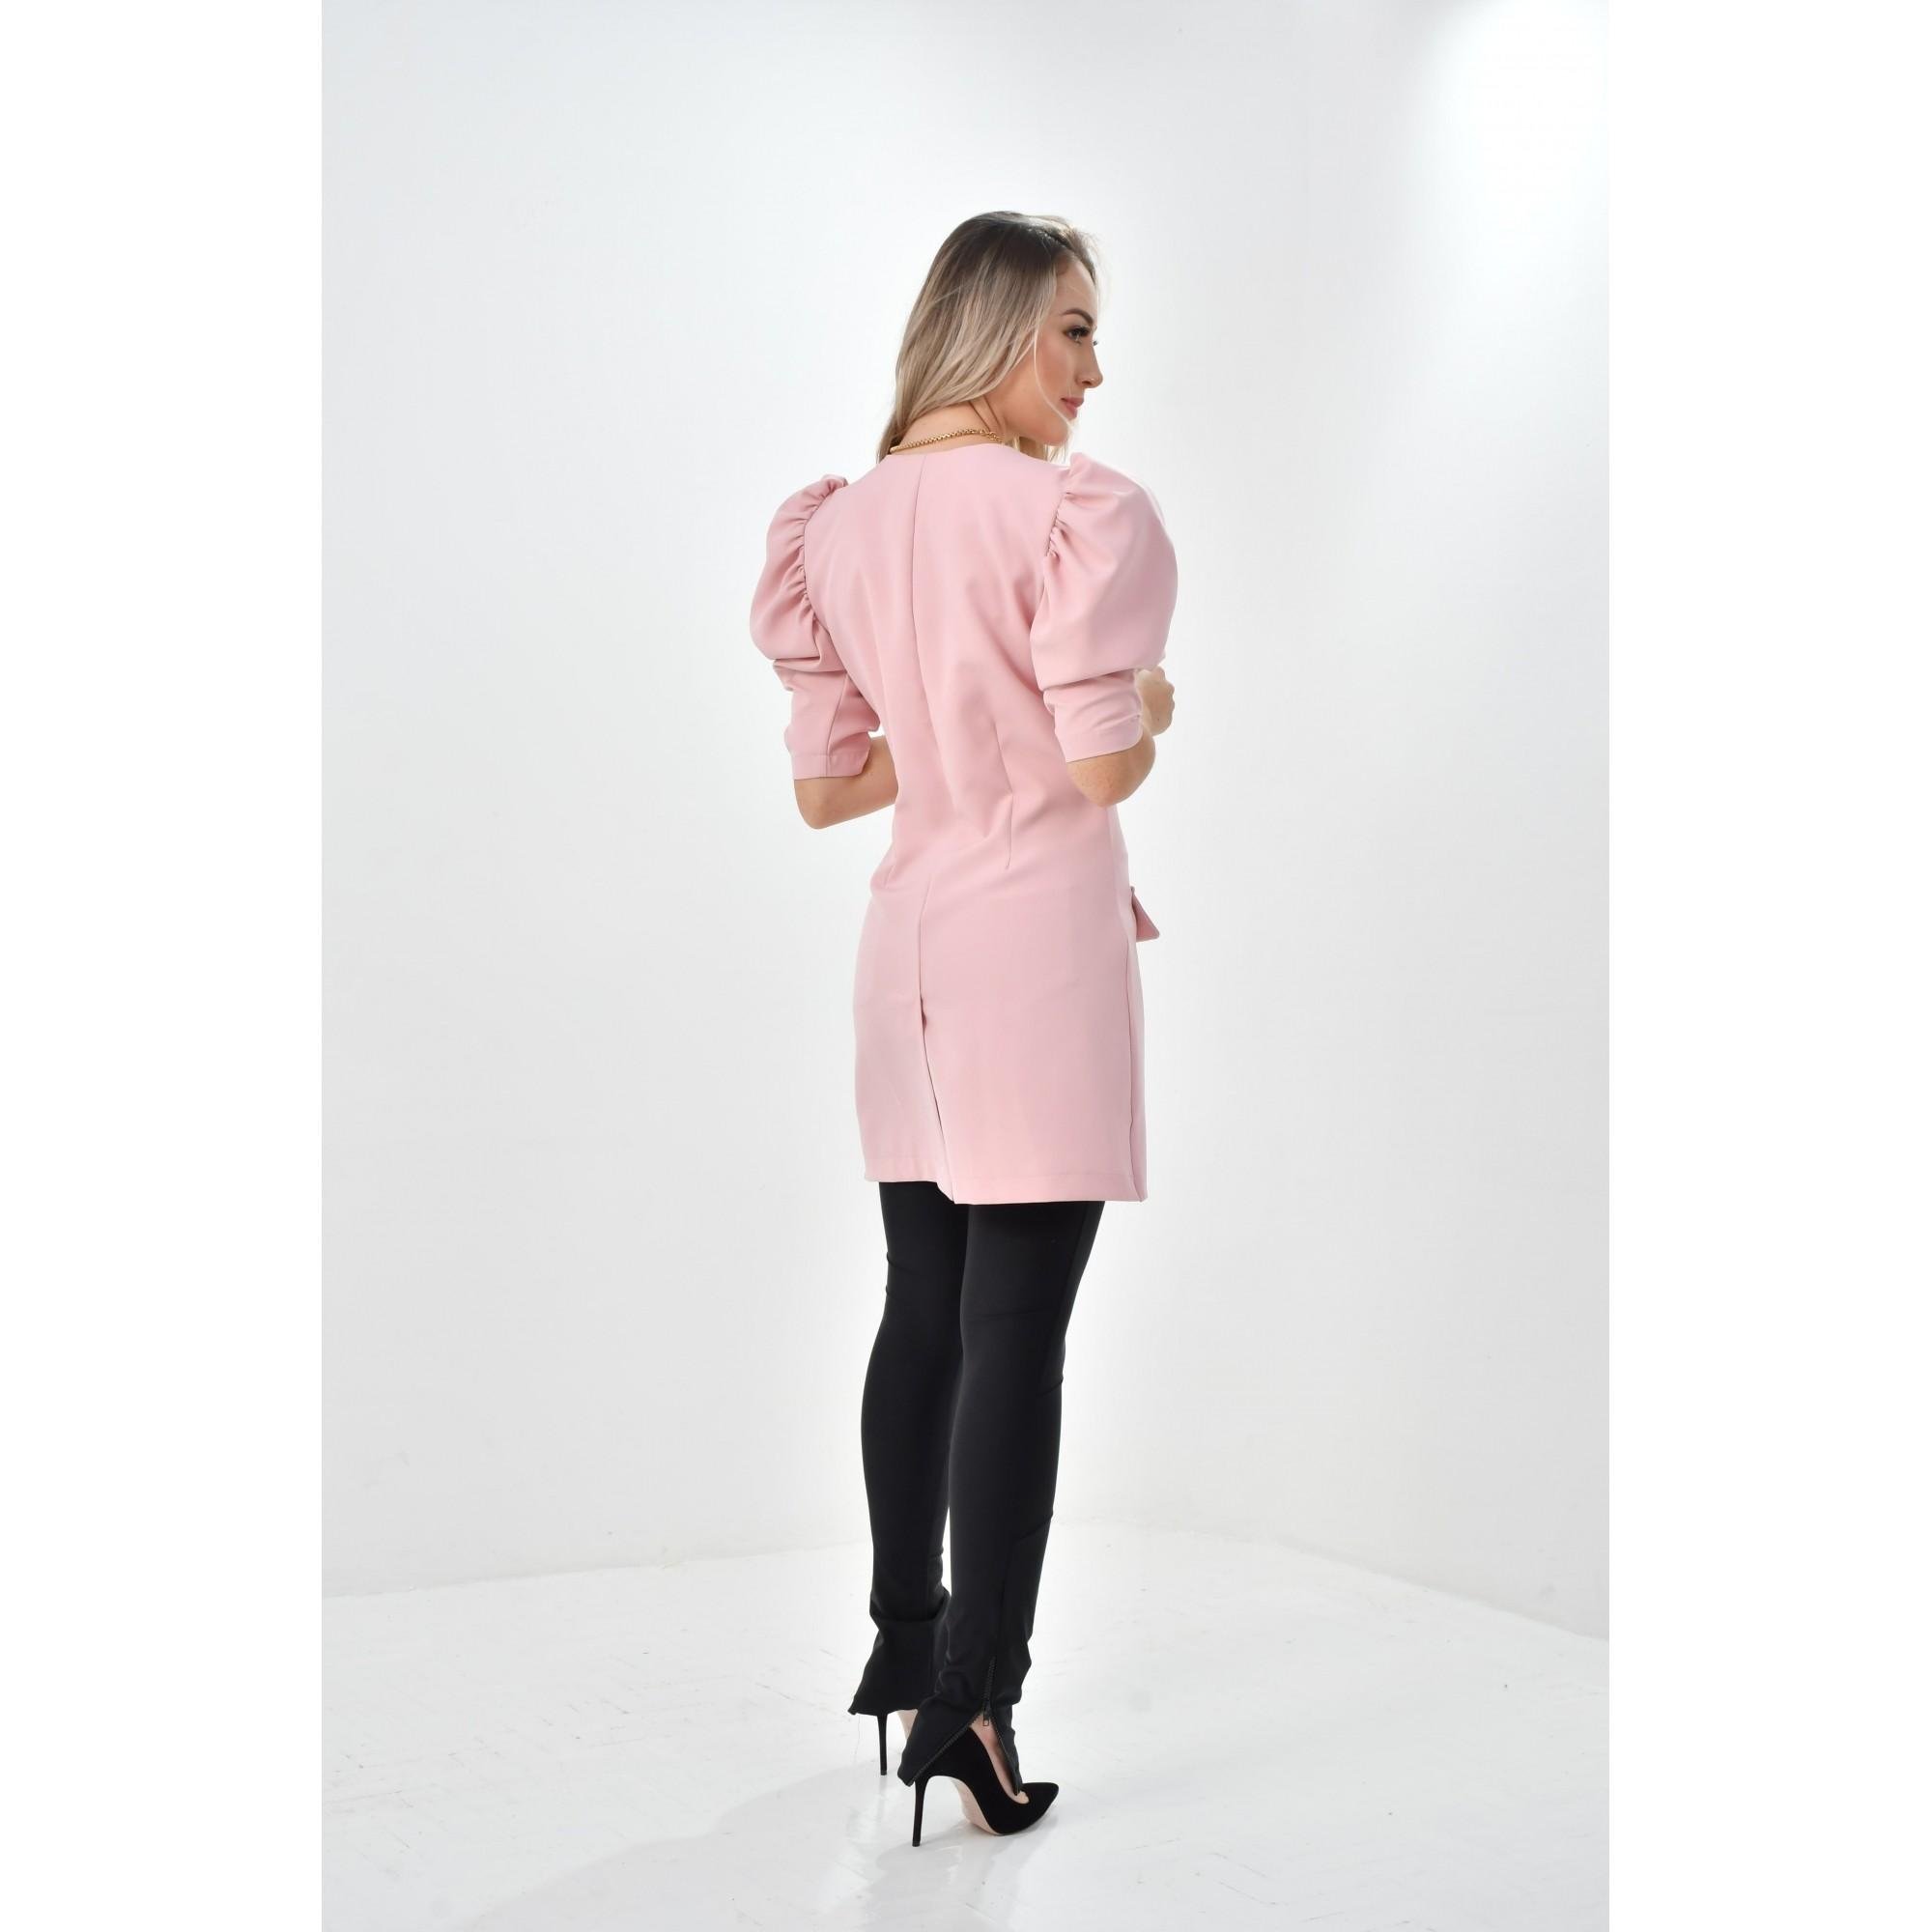 jaleco Paola  - Luxo Branco - Jalecos Personalizado Feminino